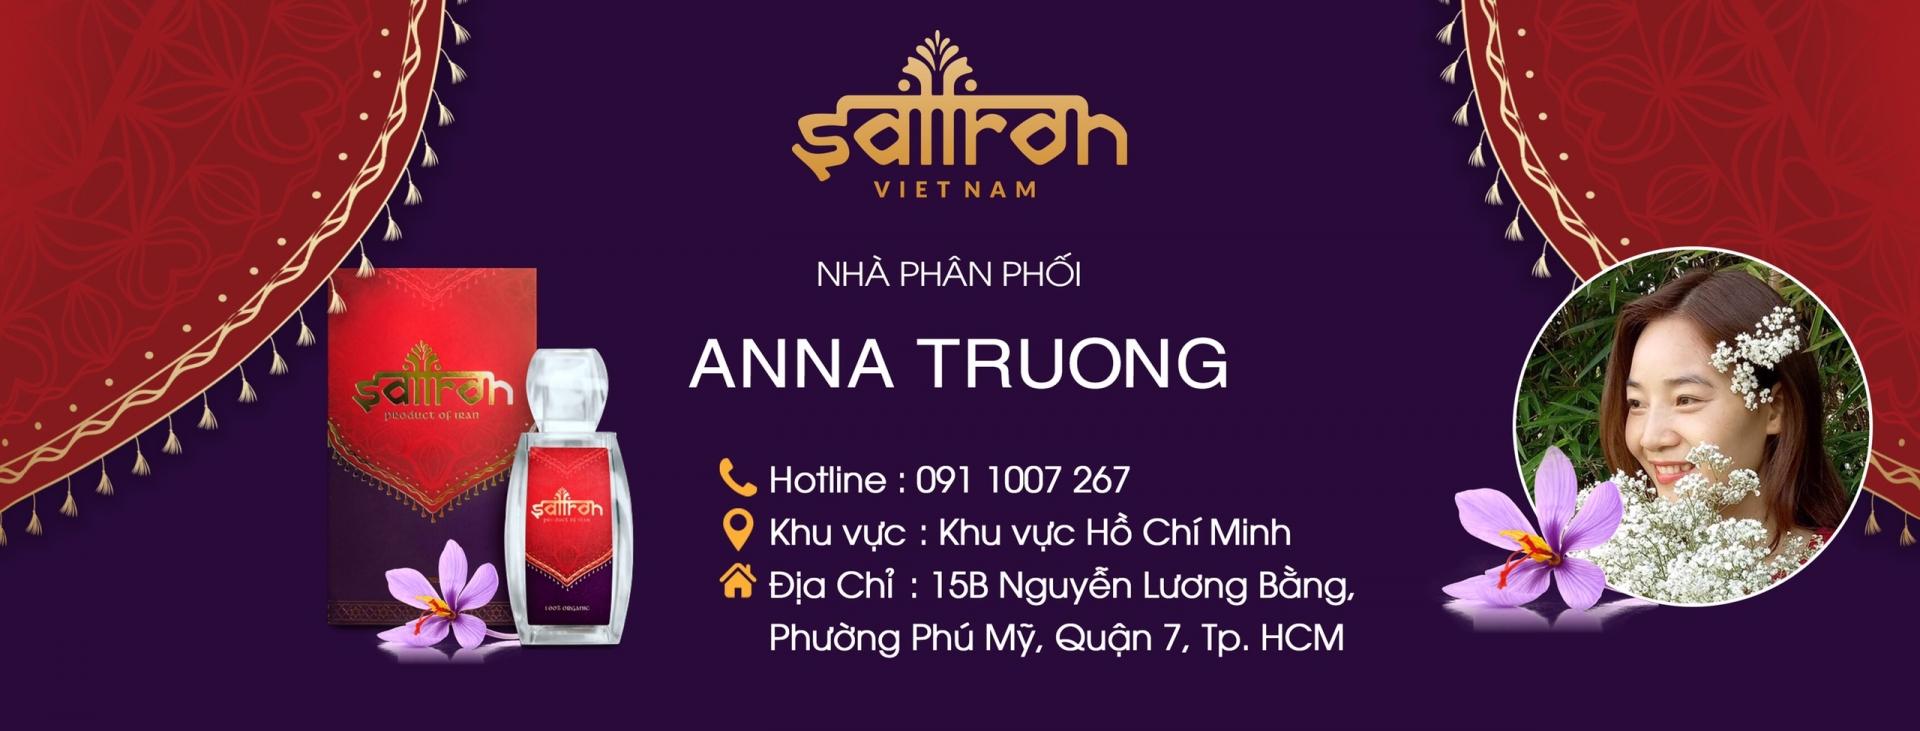 Ann Saffron - Đại Lý Saffron Việt Nam